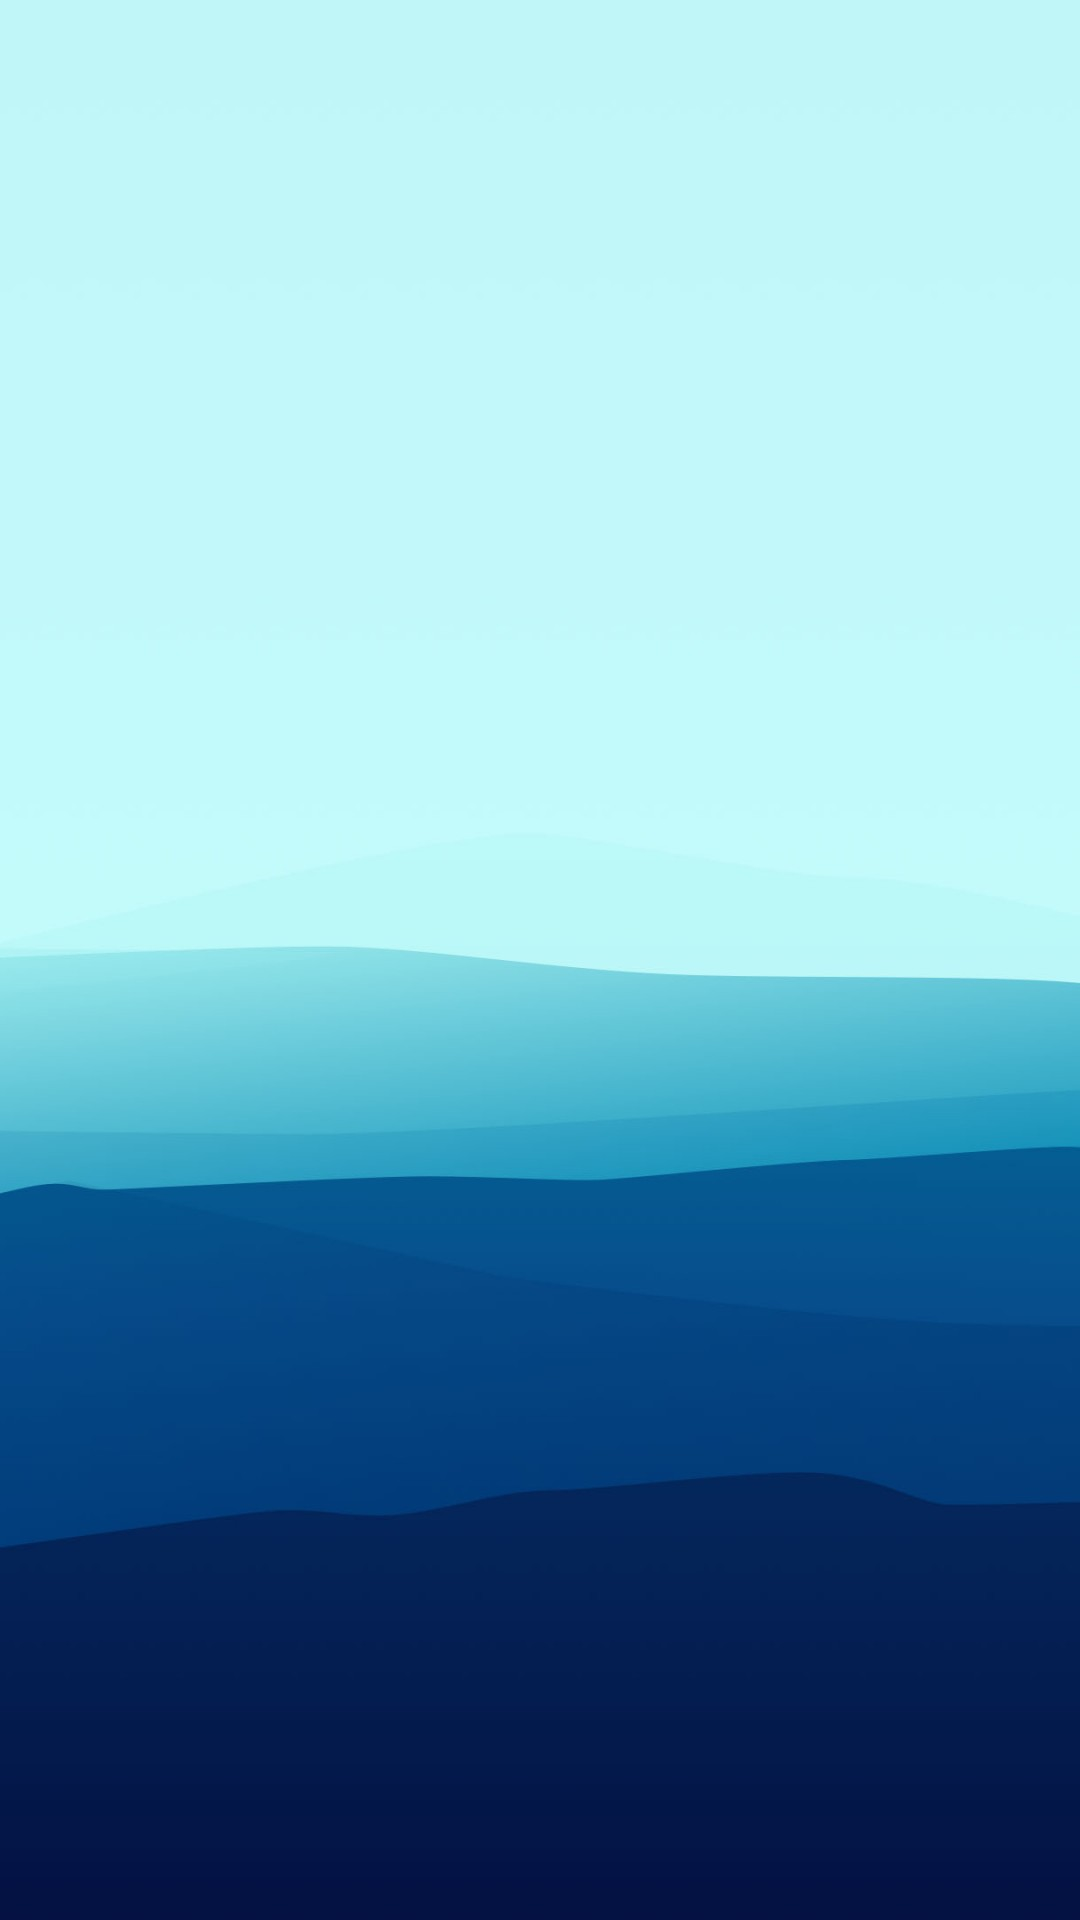 Wallpaper Landscape Flat 4k 5k Fog Iphone Wallpaper